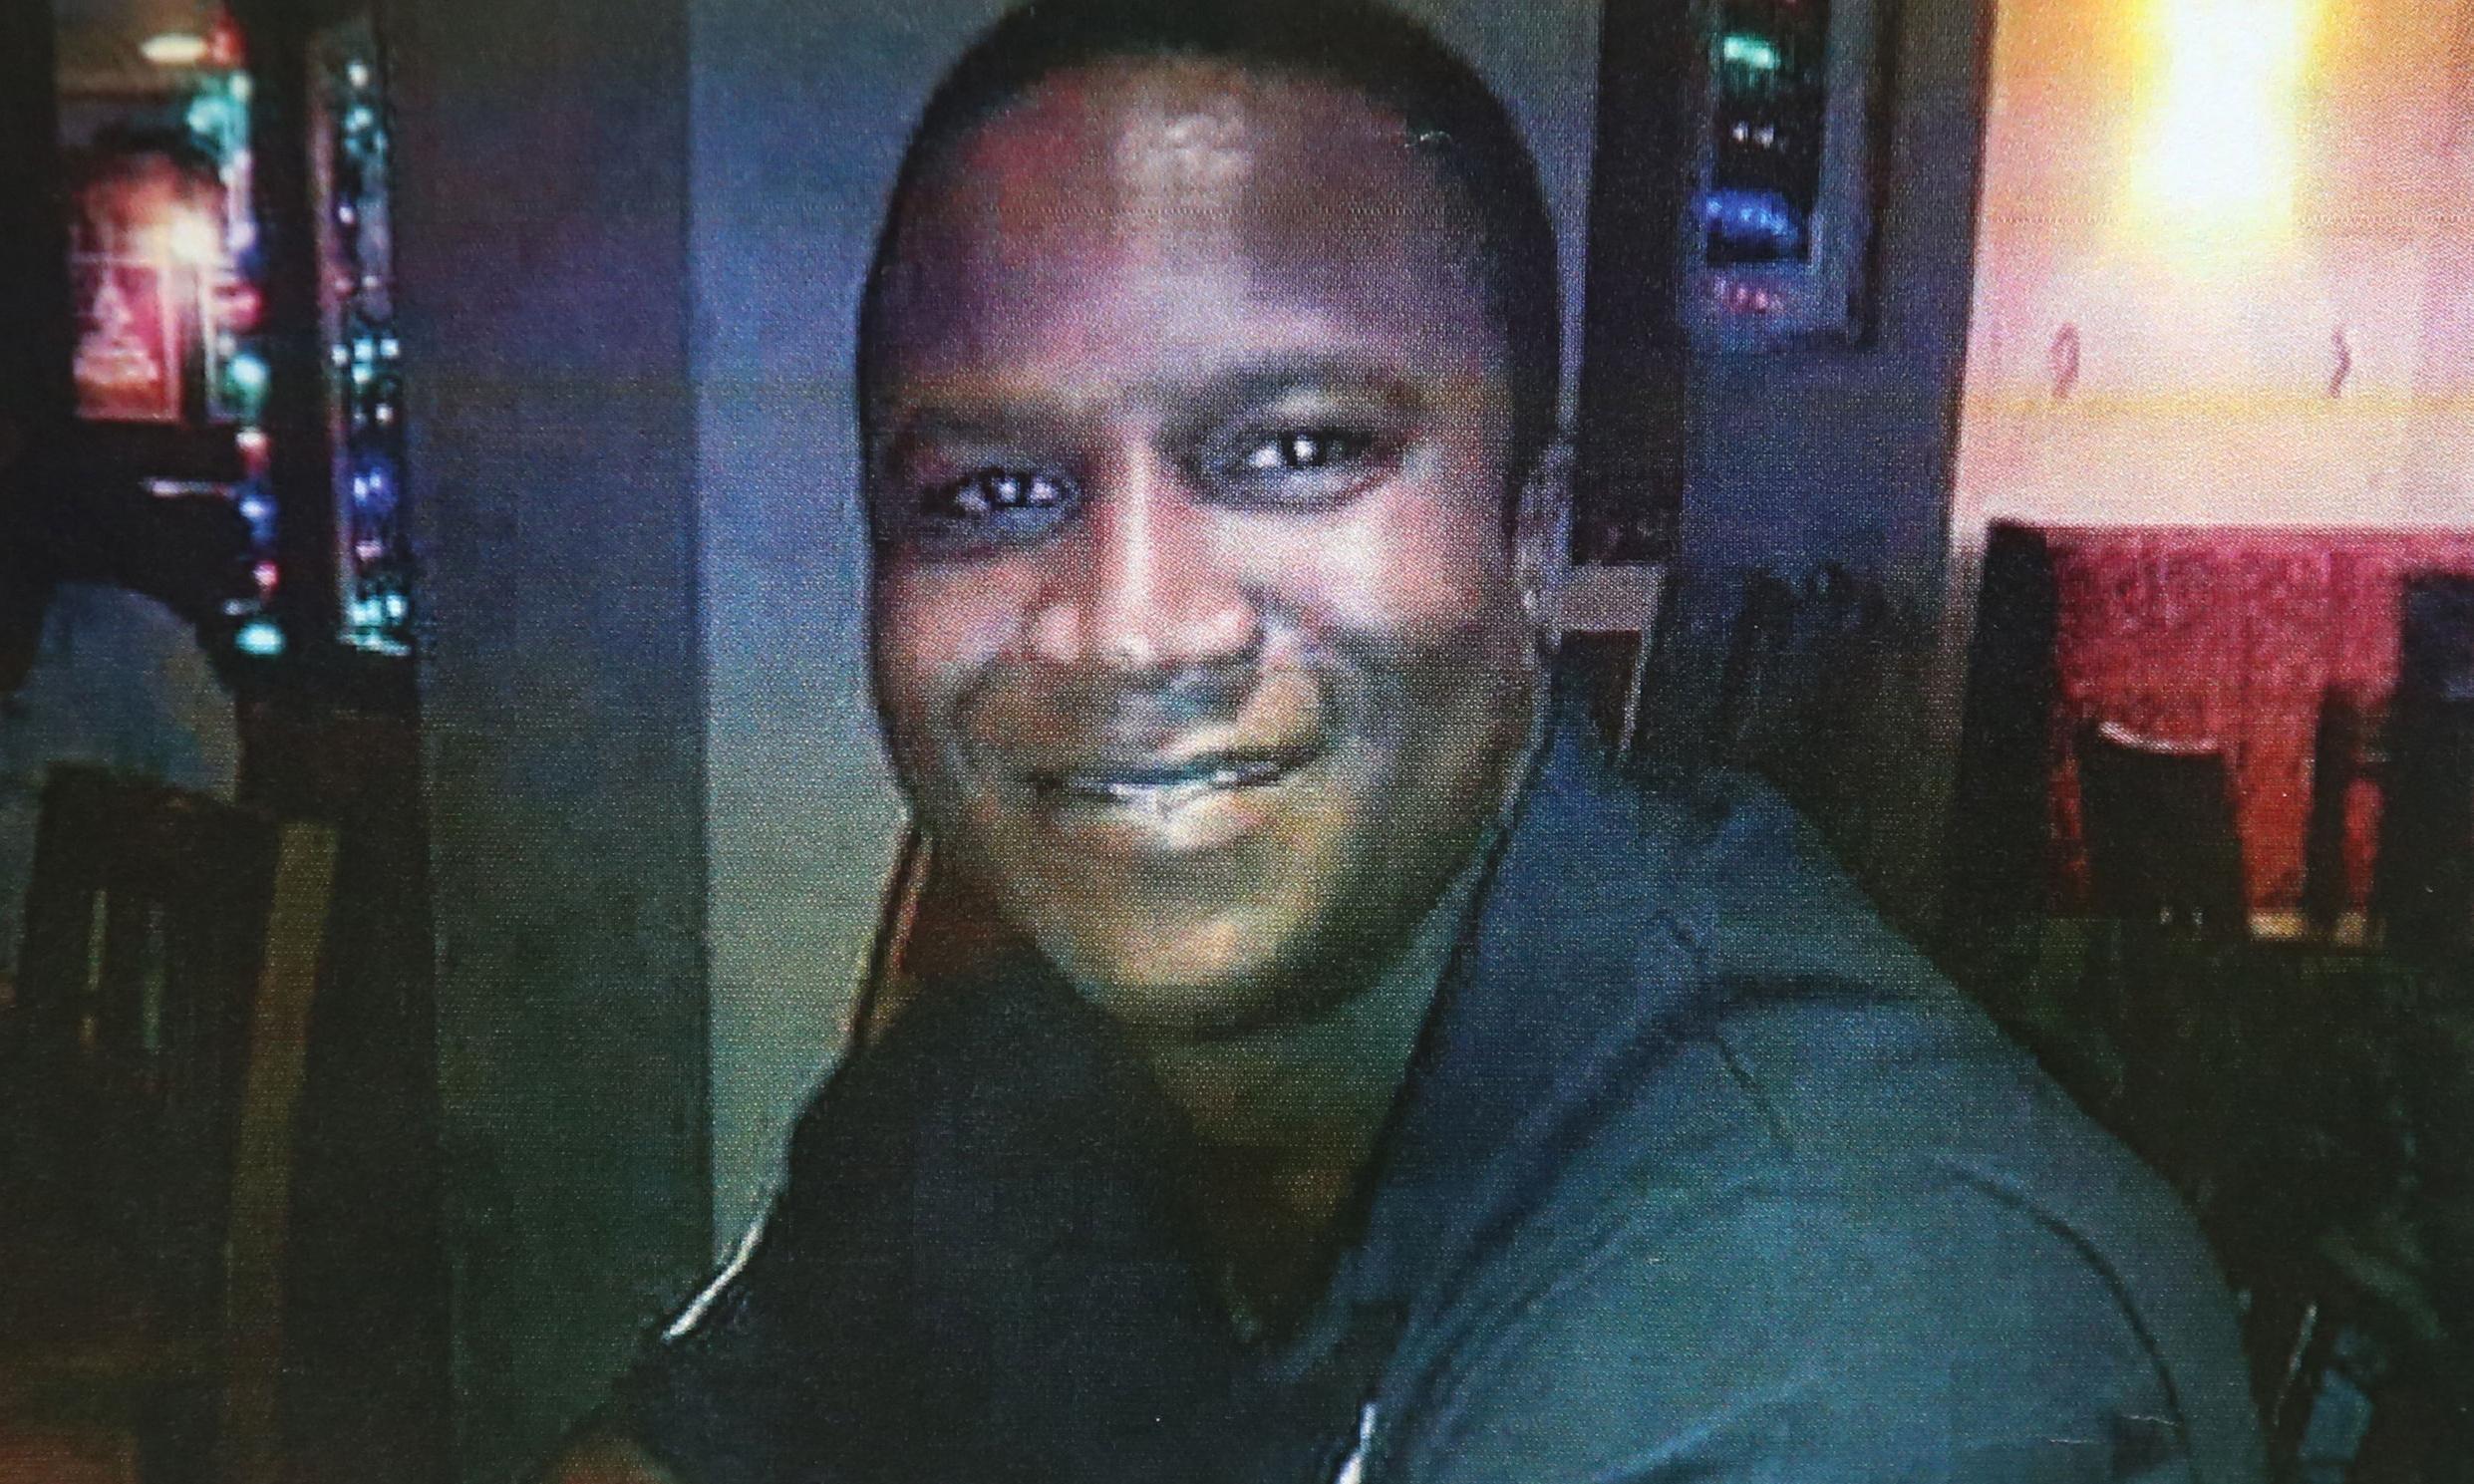 Public inquiry ordered over death of Sheku Bayoh in custody